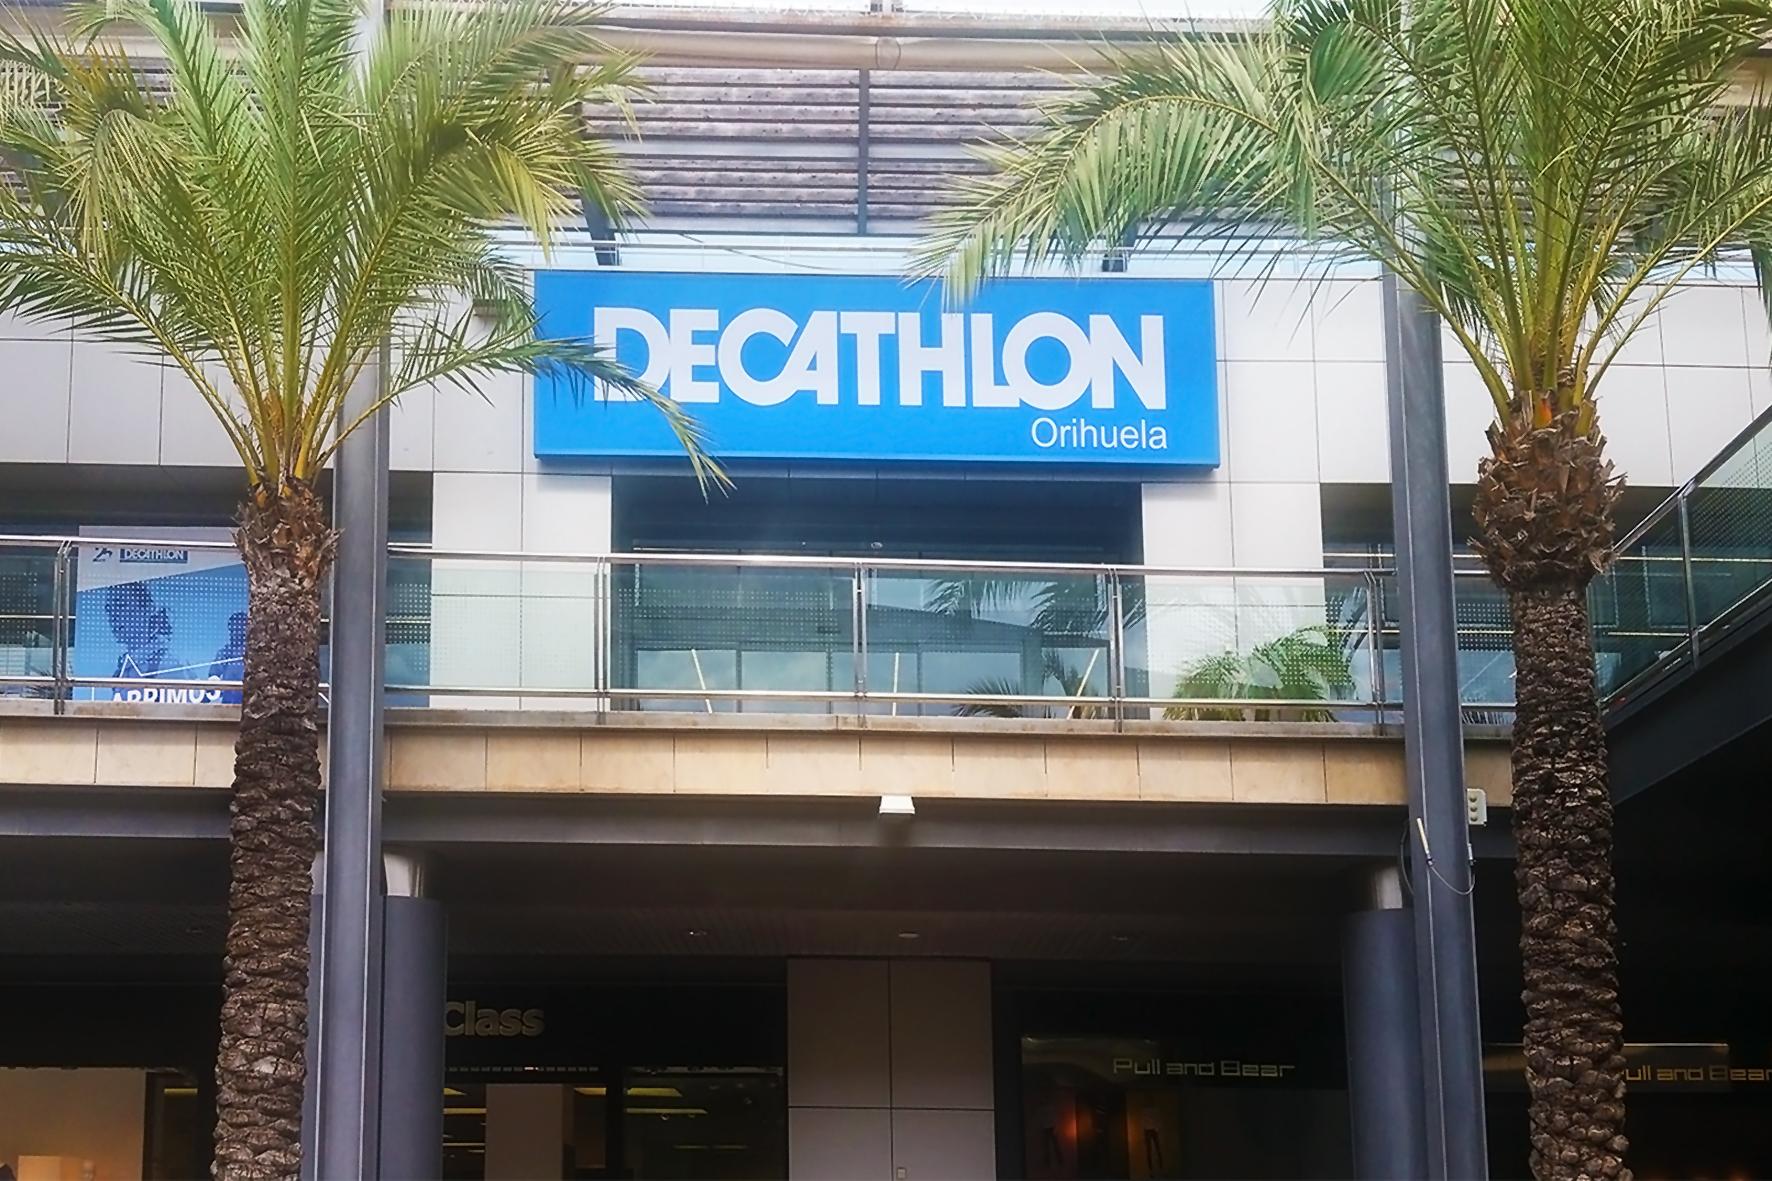 Decathlon Orihuela